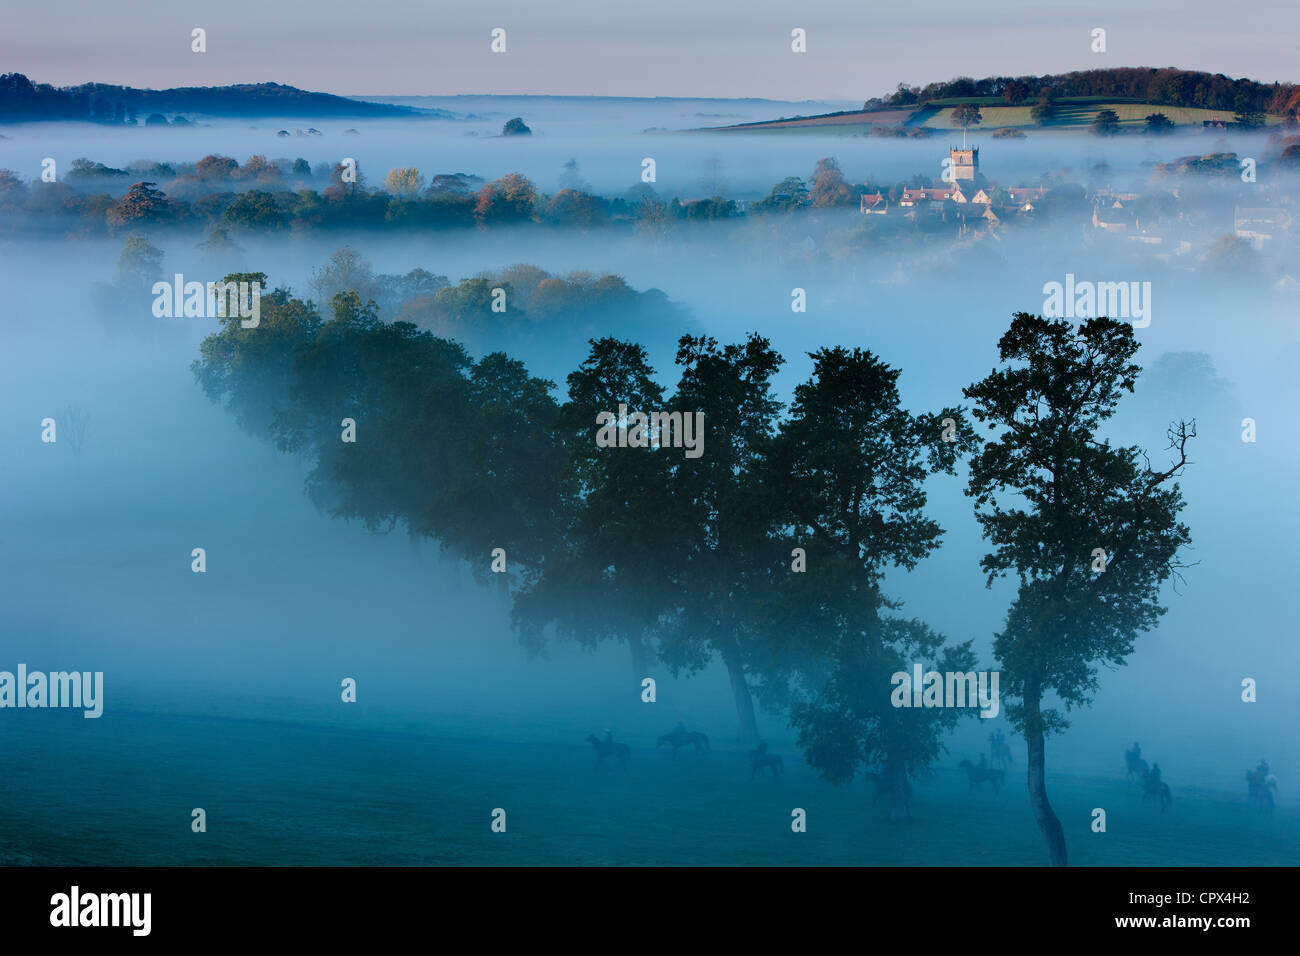 a misty autumn morning, Milborne Port, on the Dorset/Somerset Border, England UK Stock Photo